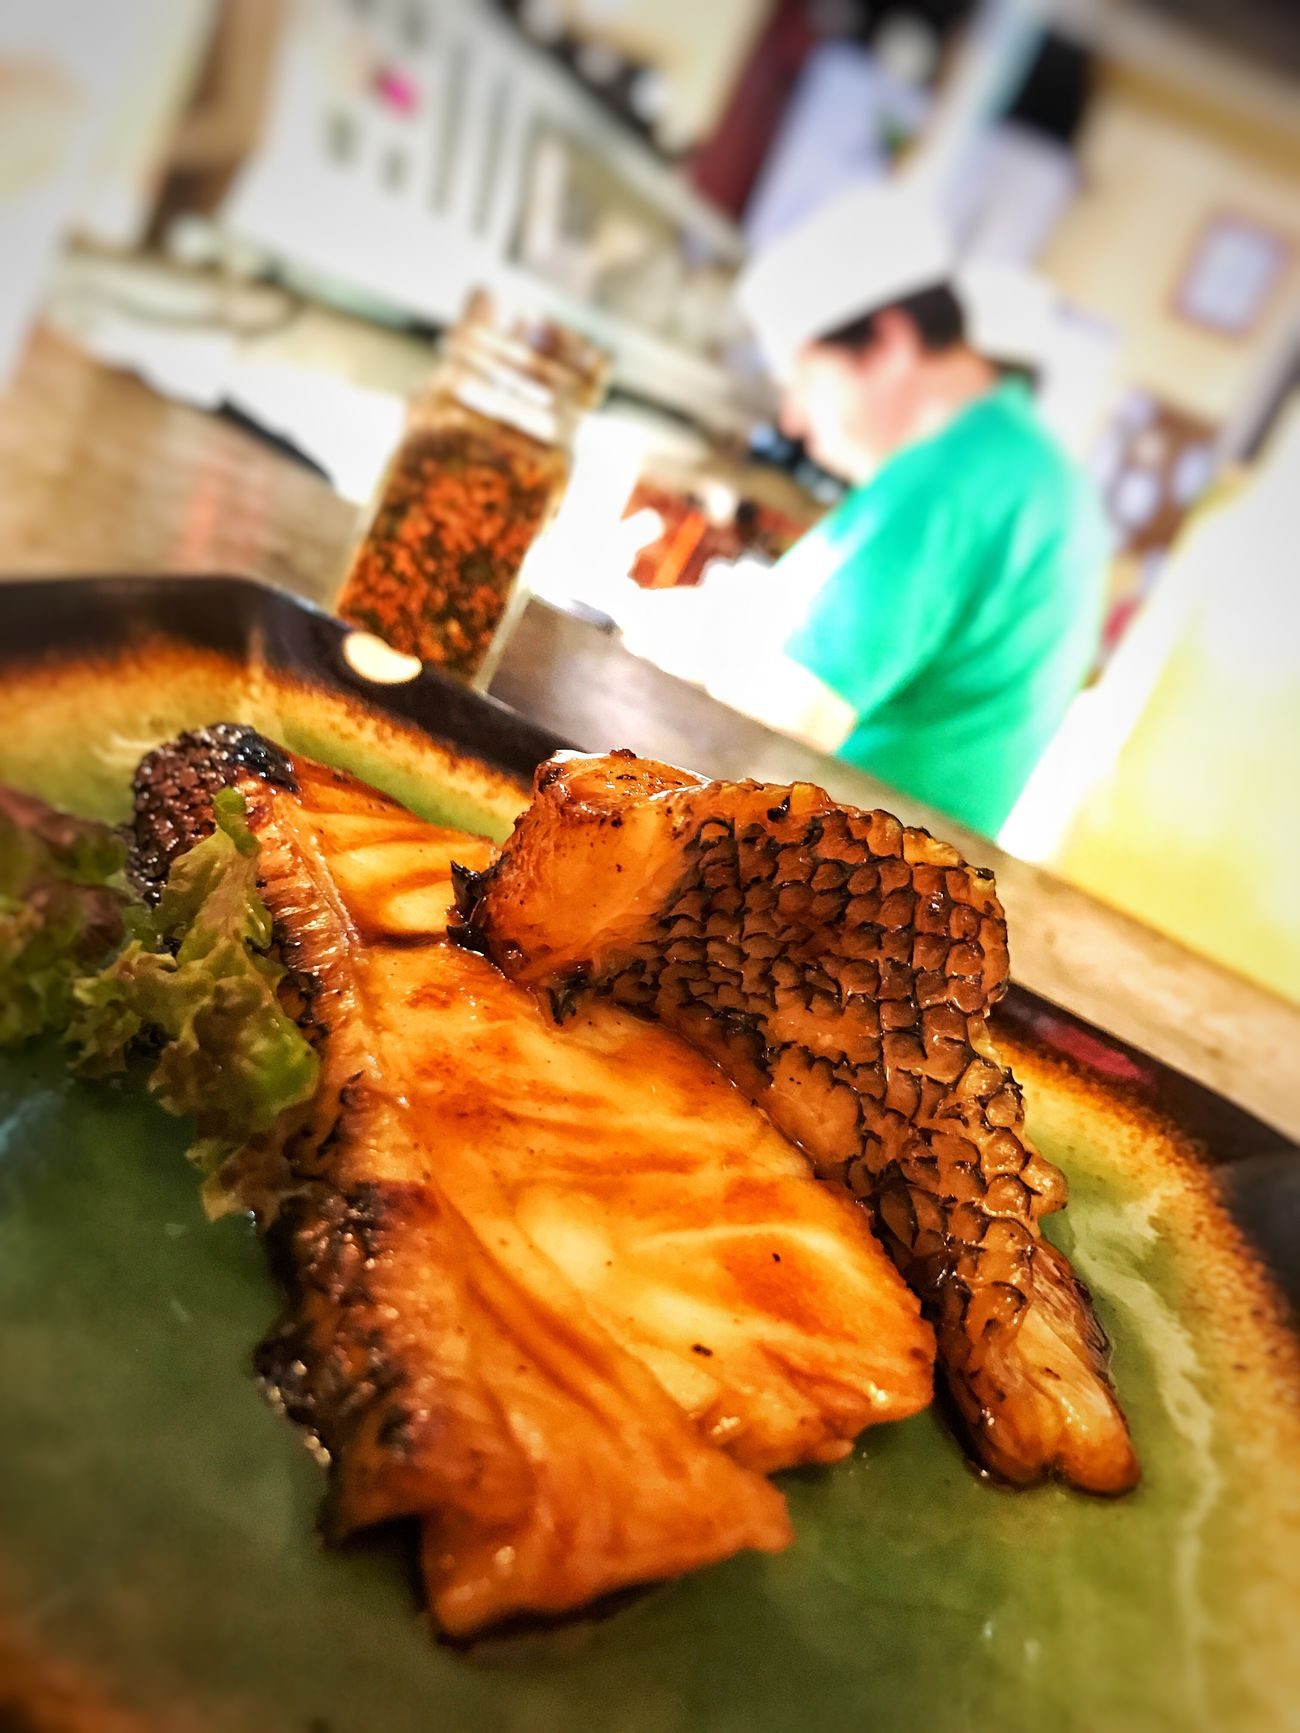 Goemon Food And Drink Indoors  Real People Food Sushi Human Hand Sushilover Mero